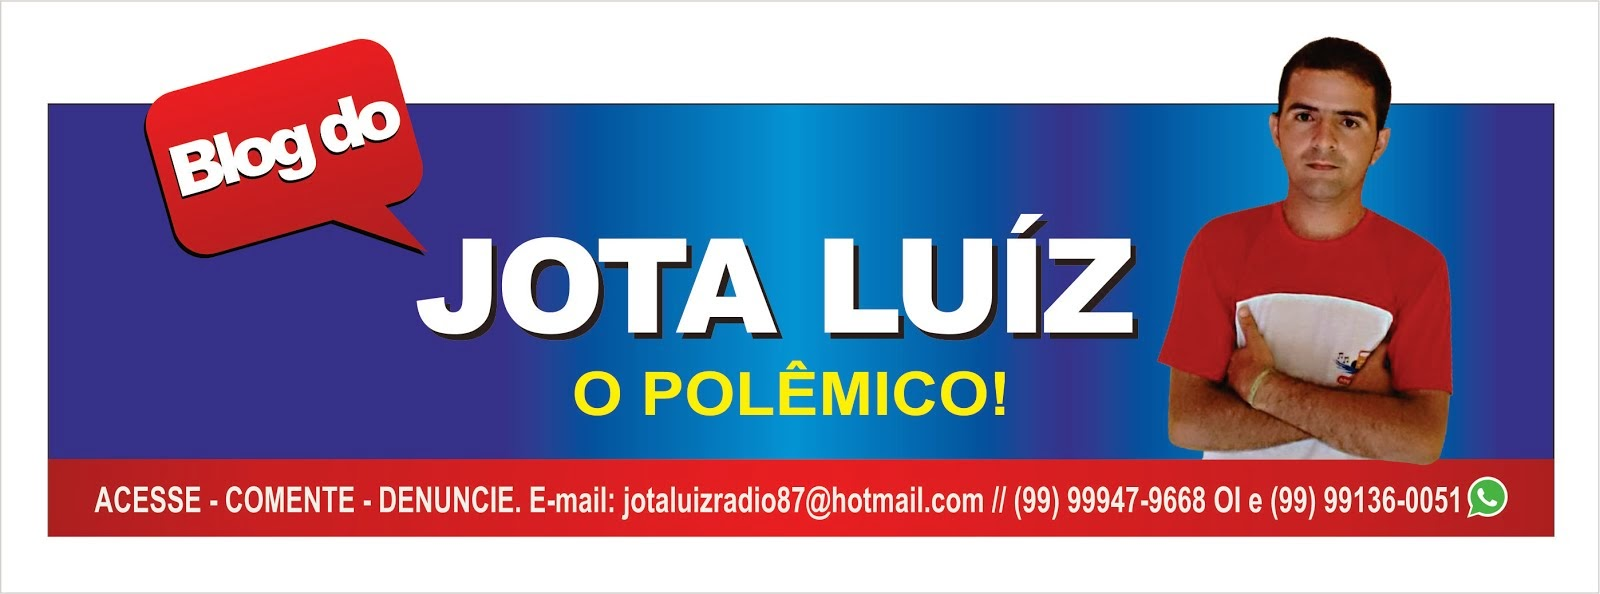 Blog do Jota Luiz / O POLÊMICO